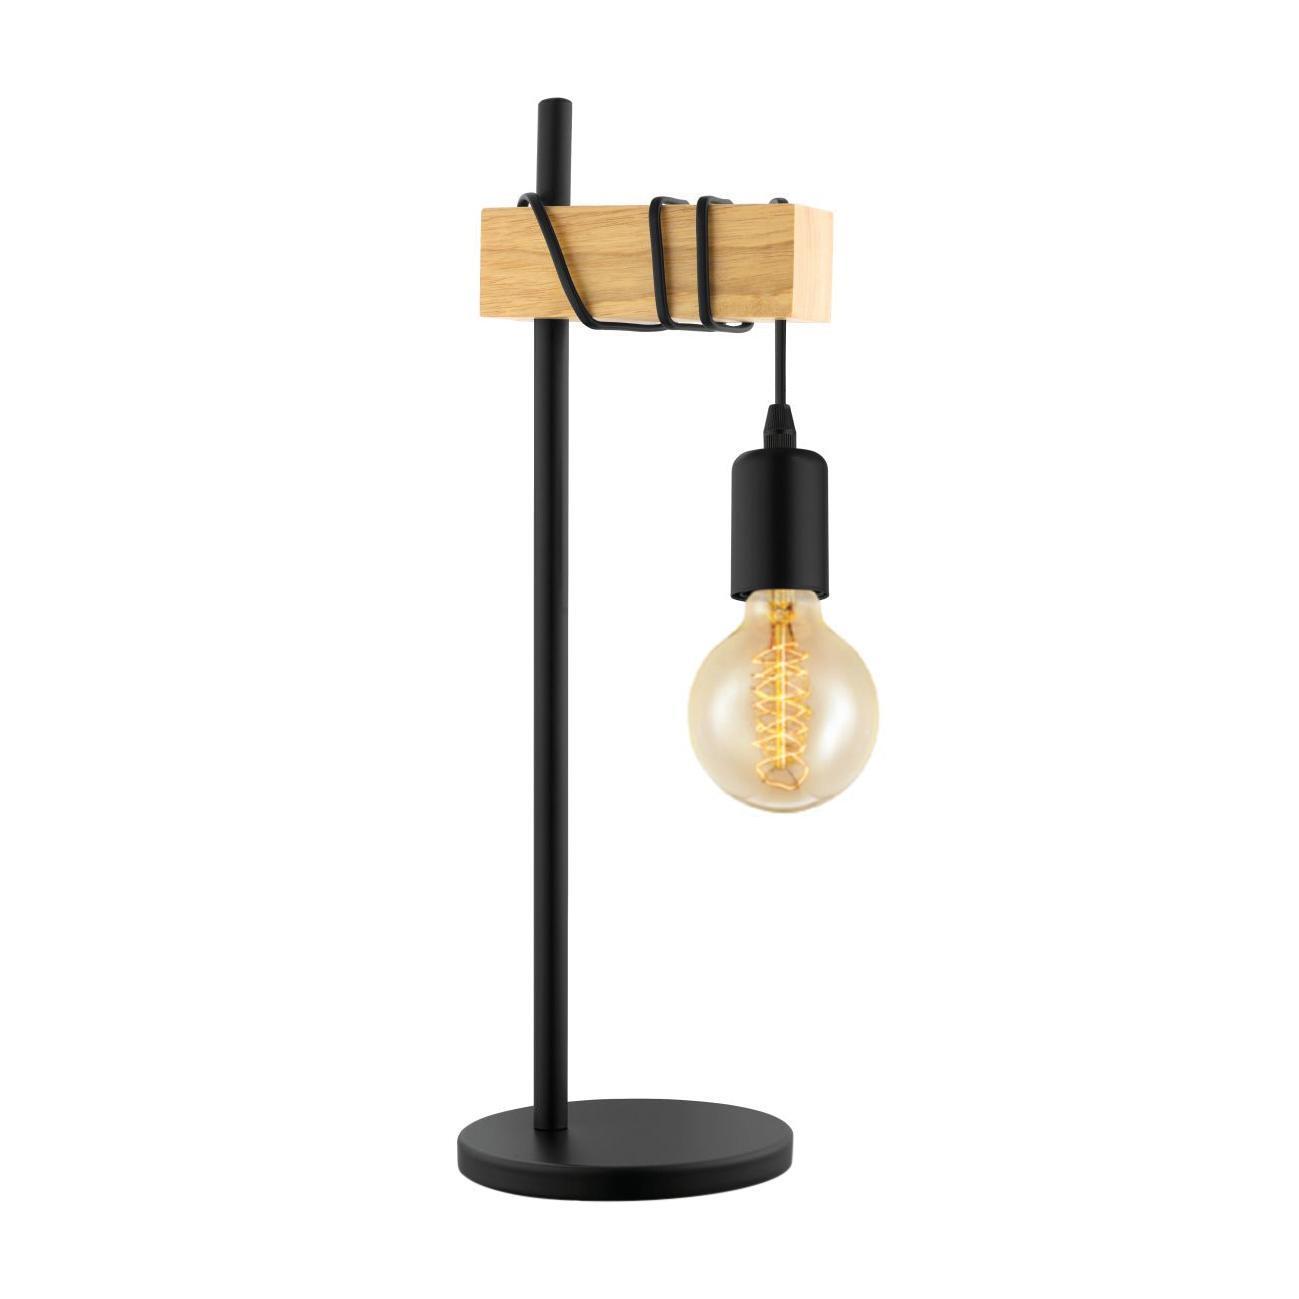 Lampada da tavolo Scandinavo Townshend nero , in metallo, EGLO - 4